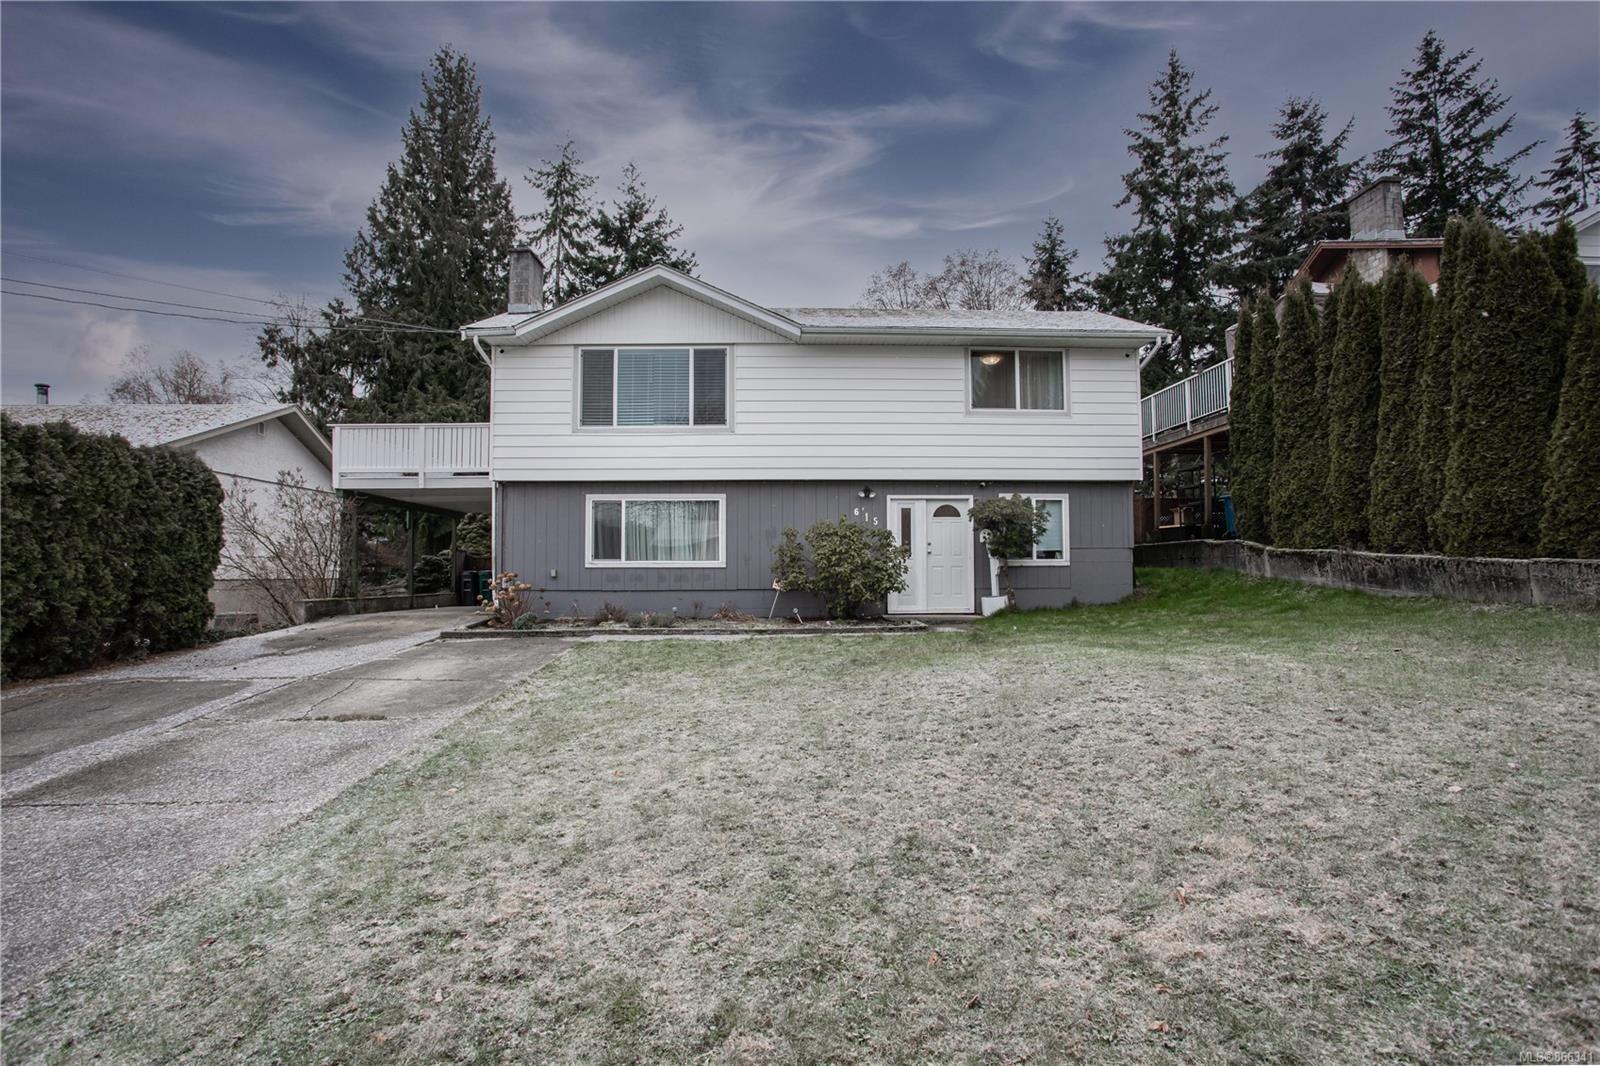 Main Photo: 615 7th St in : Na South Nanaimo House for sale (Nanaimo)  : MLS®# 866341